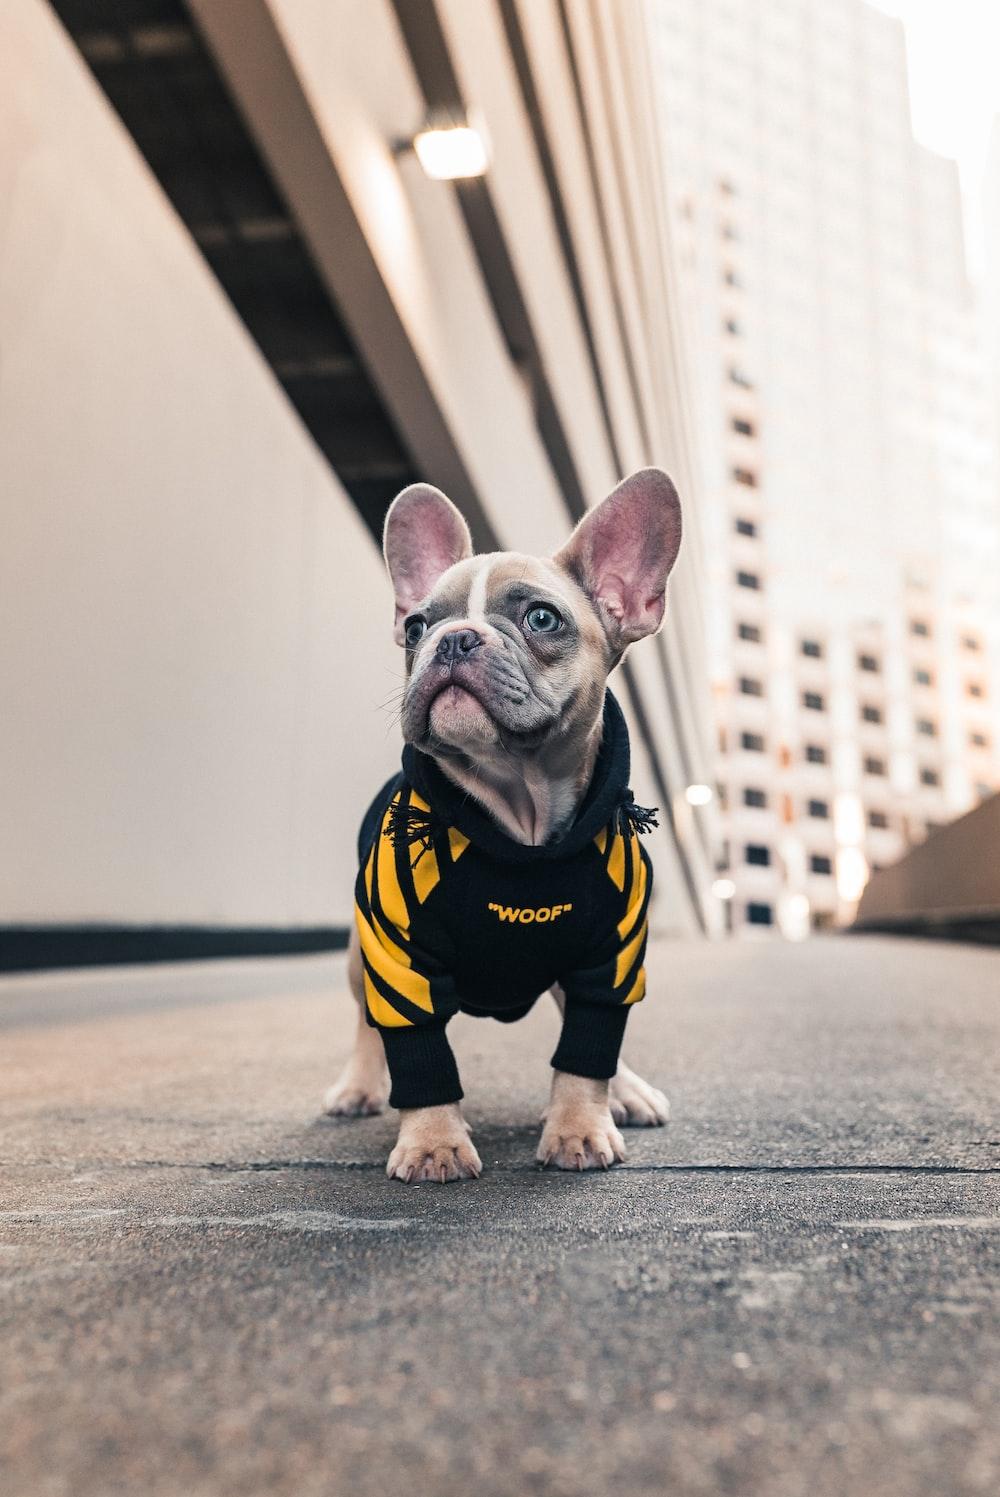 brown french bulldog wearing black and yellow shirt